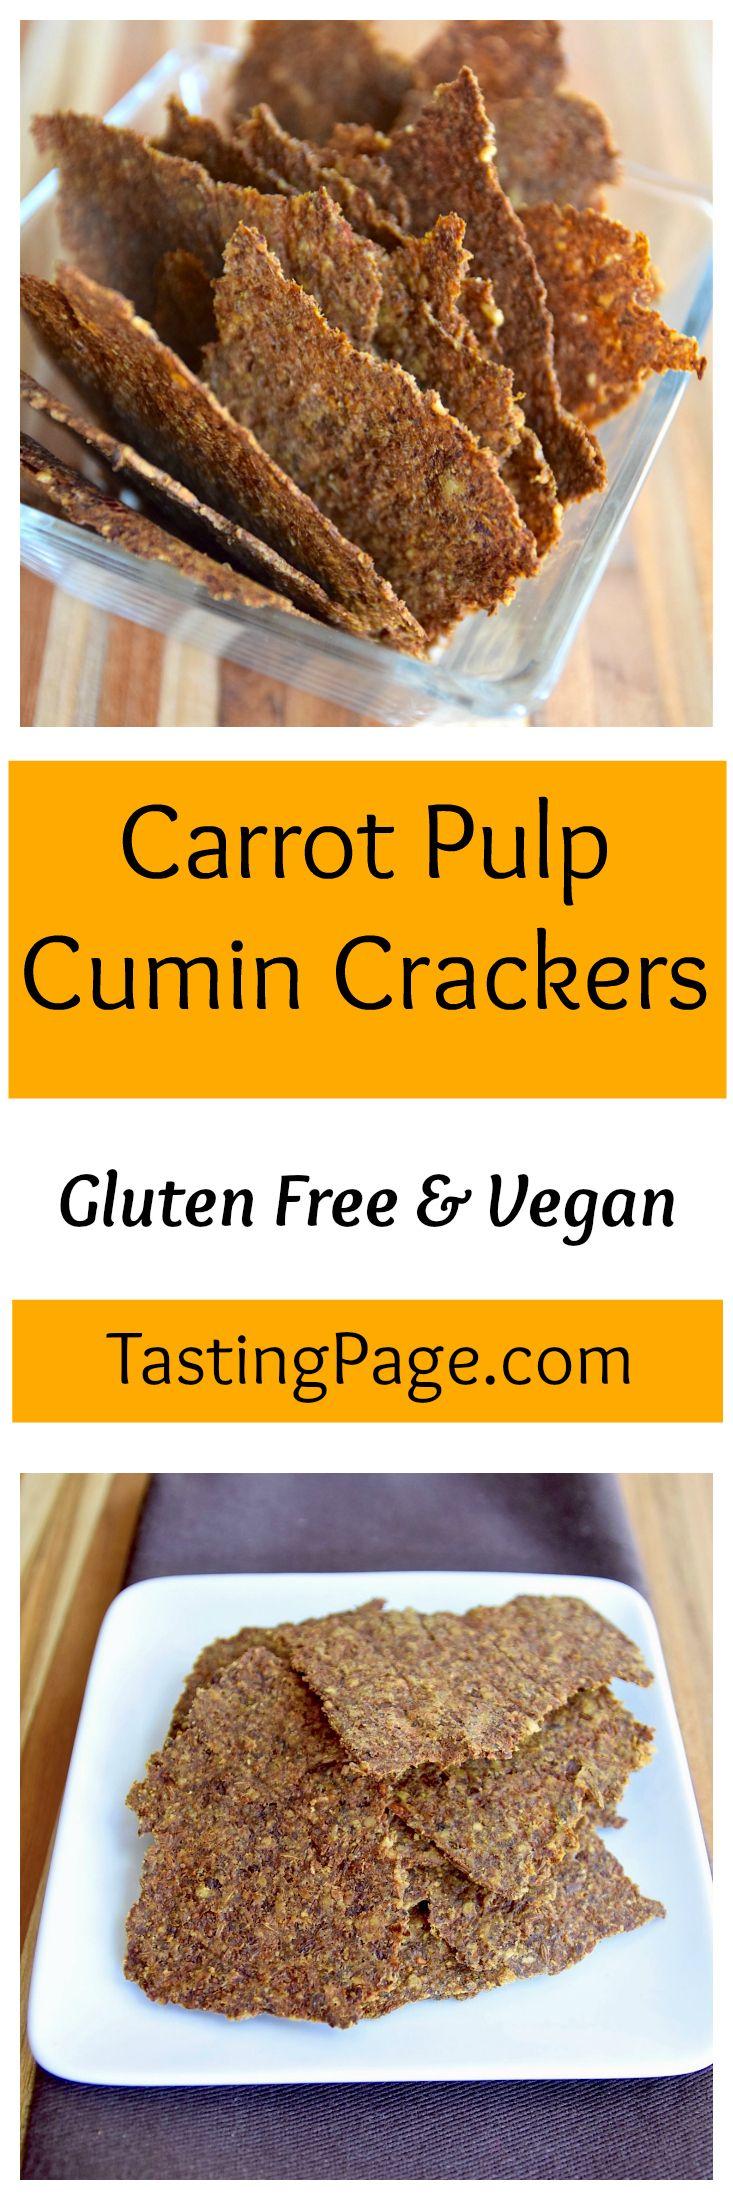 Carrot pulp cumin crackers - a healthy, homemade snack that's gluten free & vegan | TastingPage.com